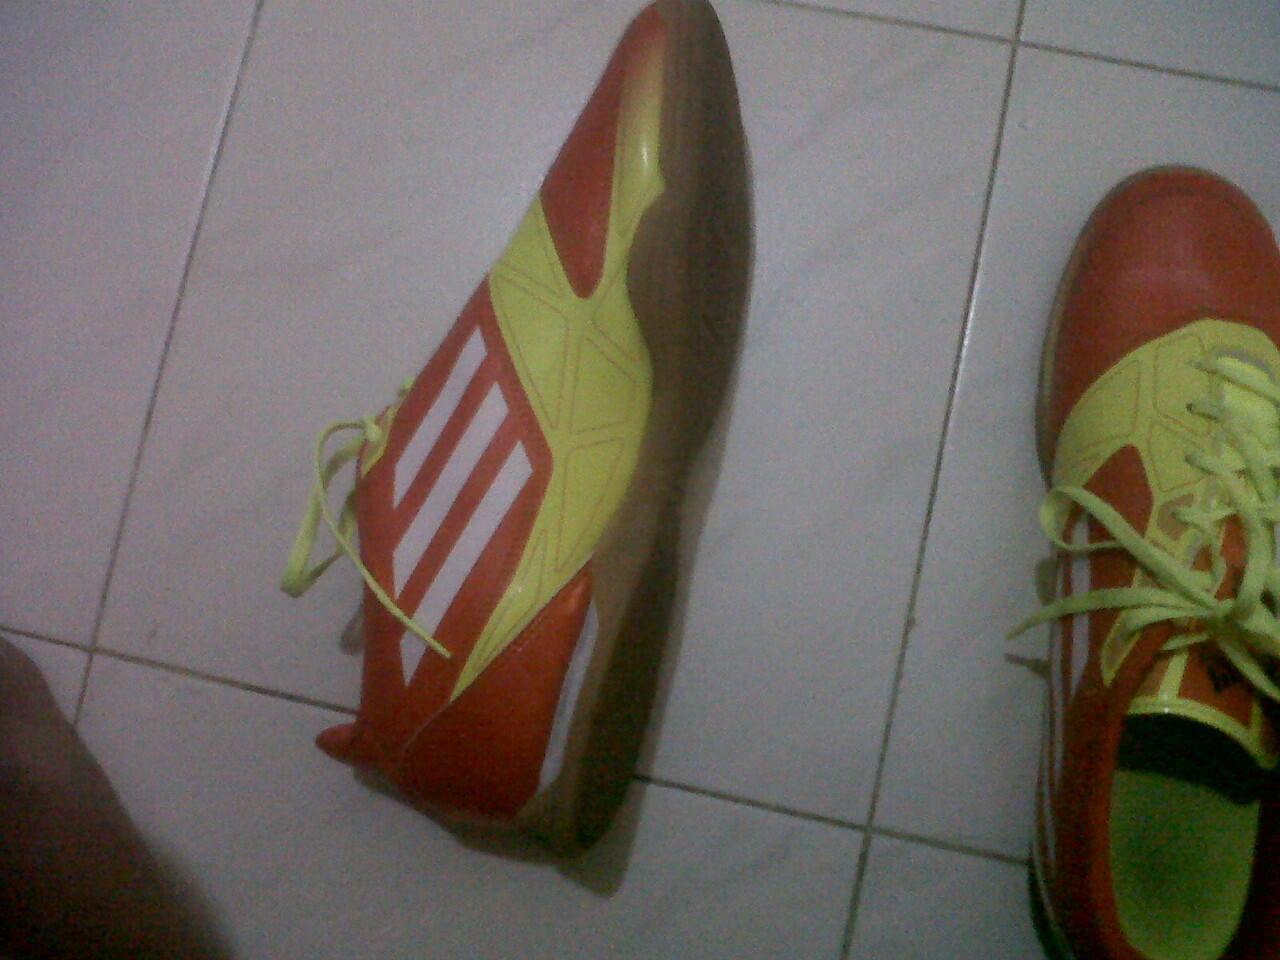 Jual/barter sepatu futsal adidas f5 micoach orange kuning ORI